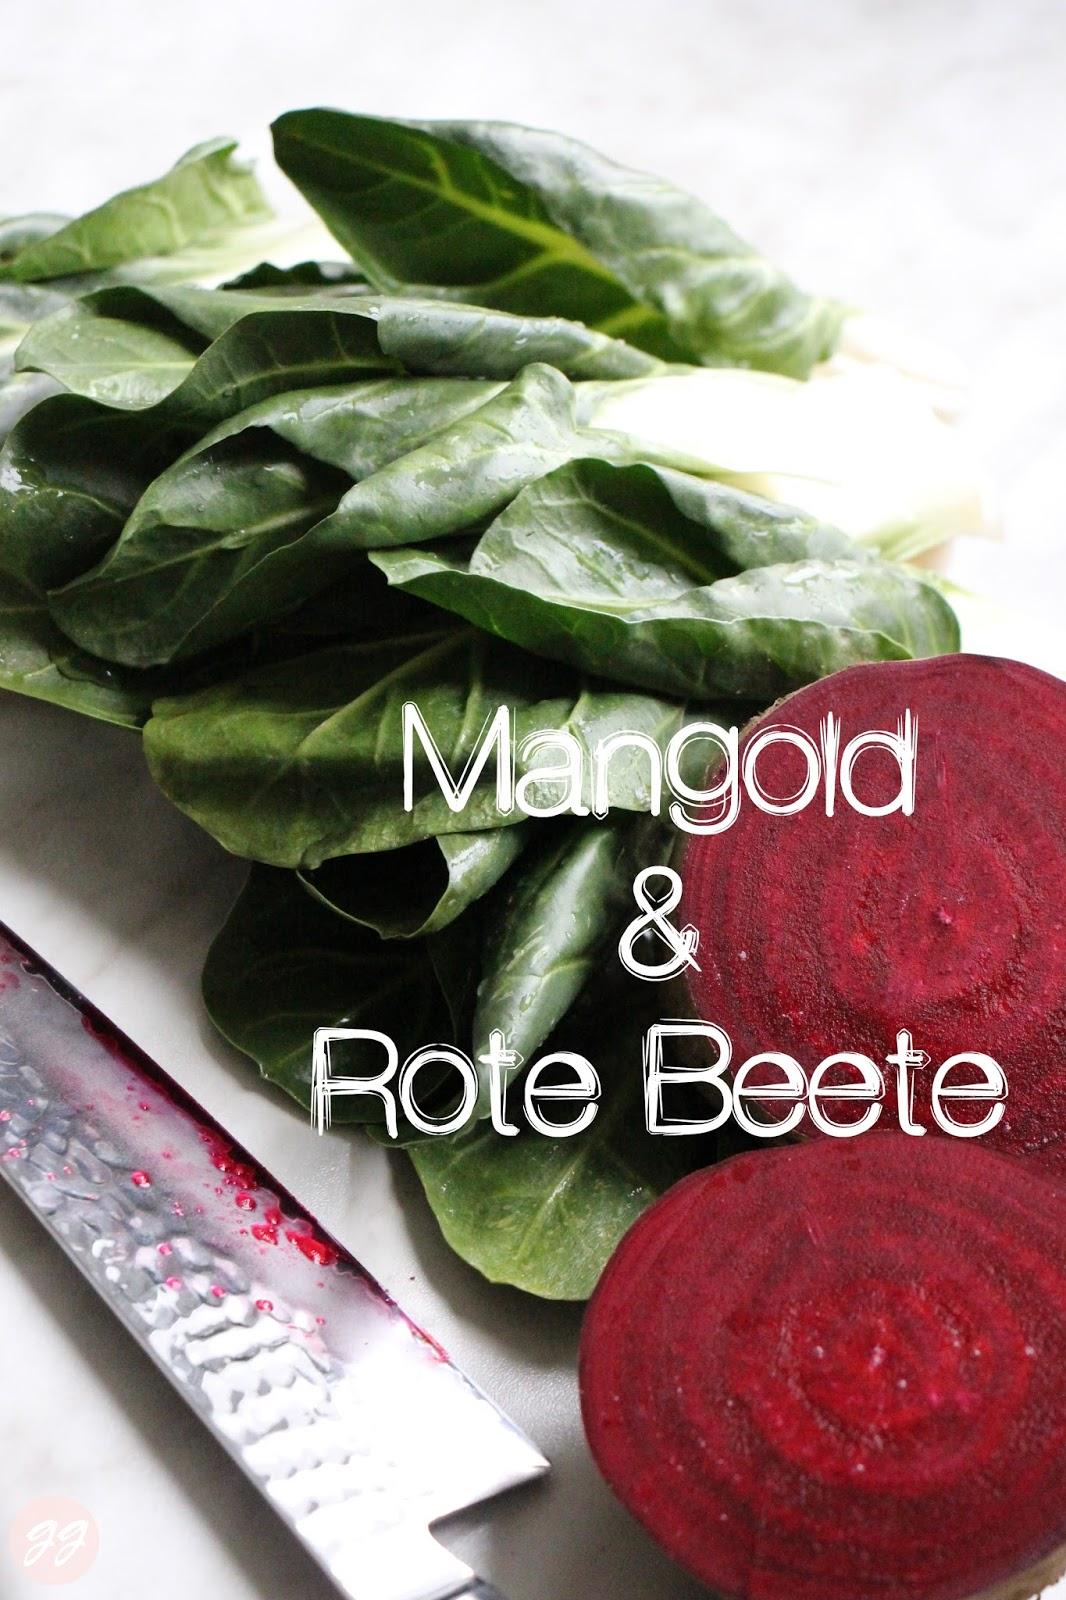 rezept mangold trifft auf rote beete gl cksgenuss. Black Bedroom Furniture Sets. Home Design Ideas